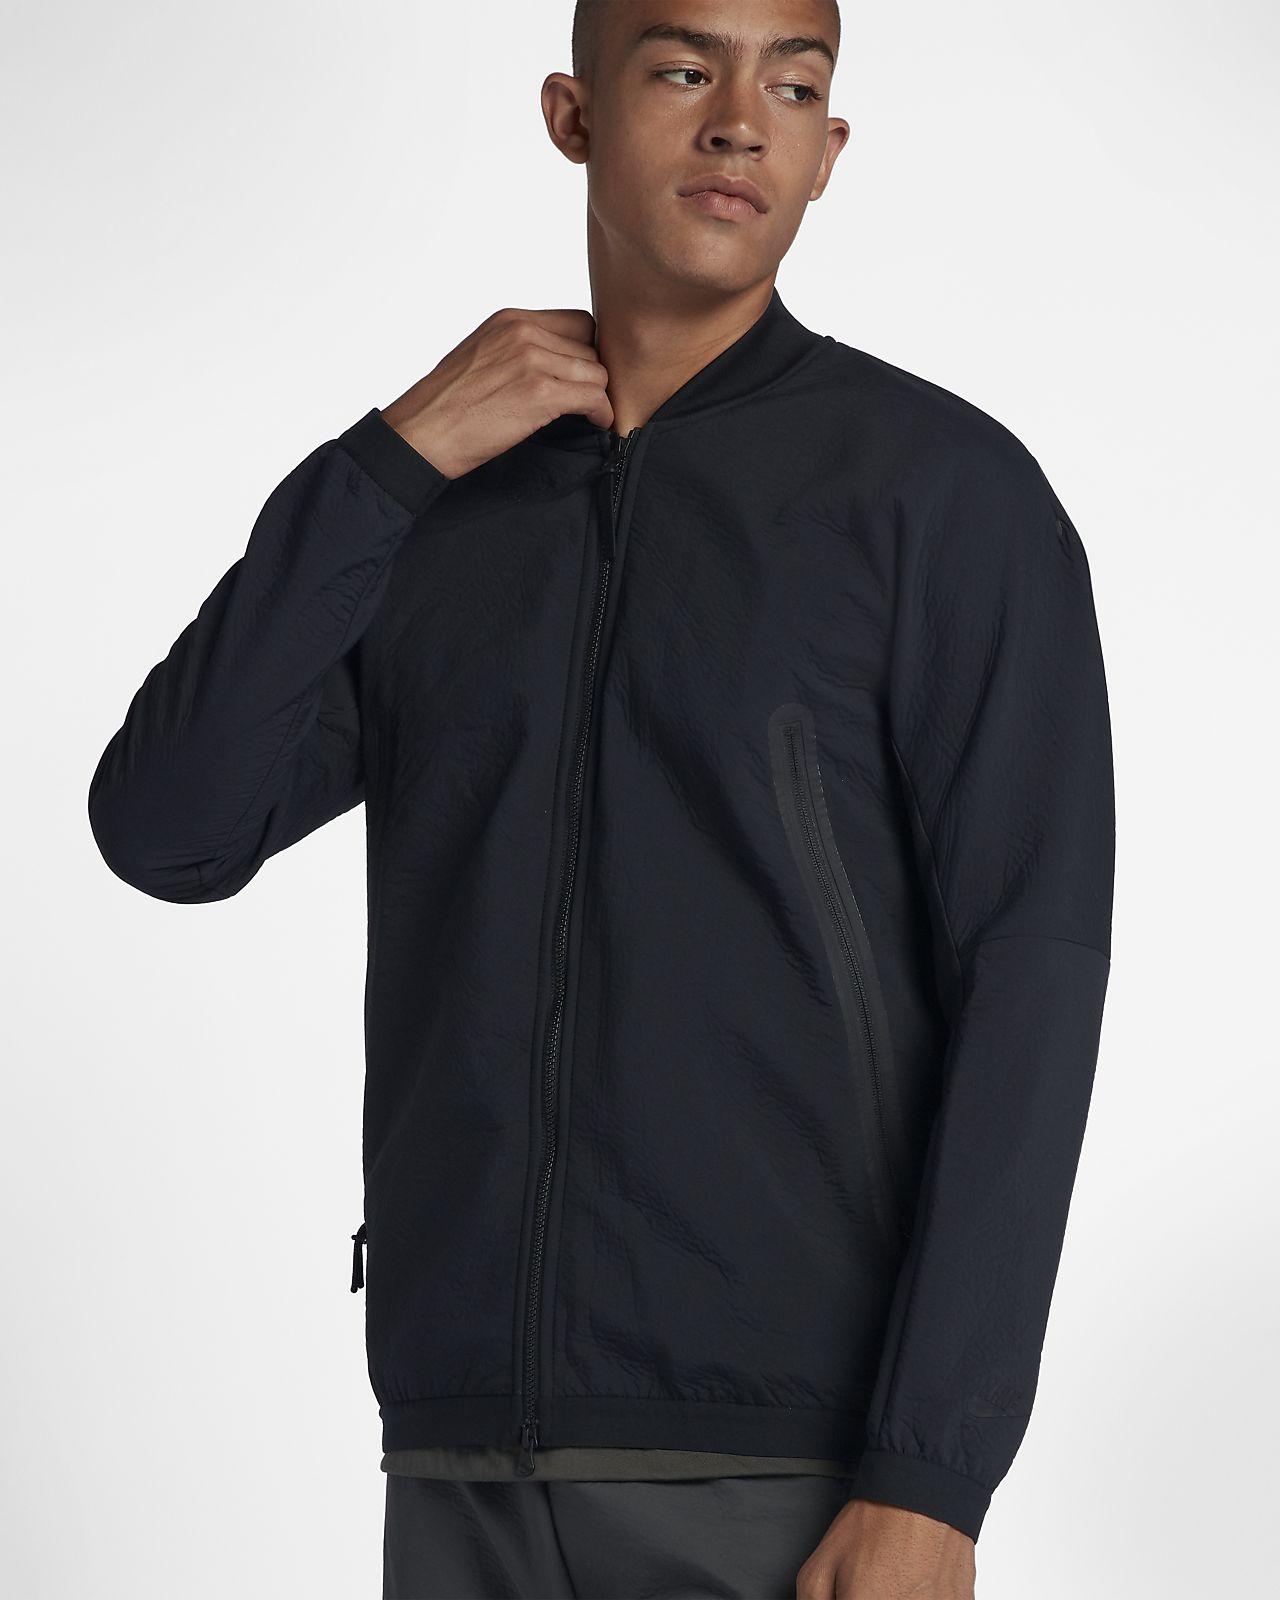 Tkaná atletická bunda Nike Sportswear Tech Pack